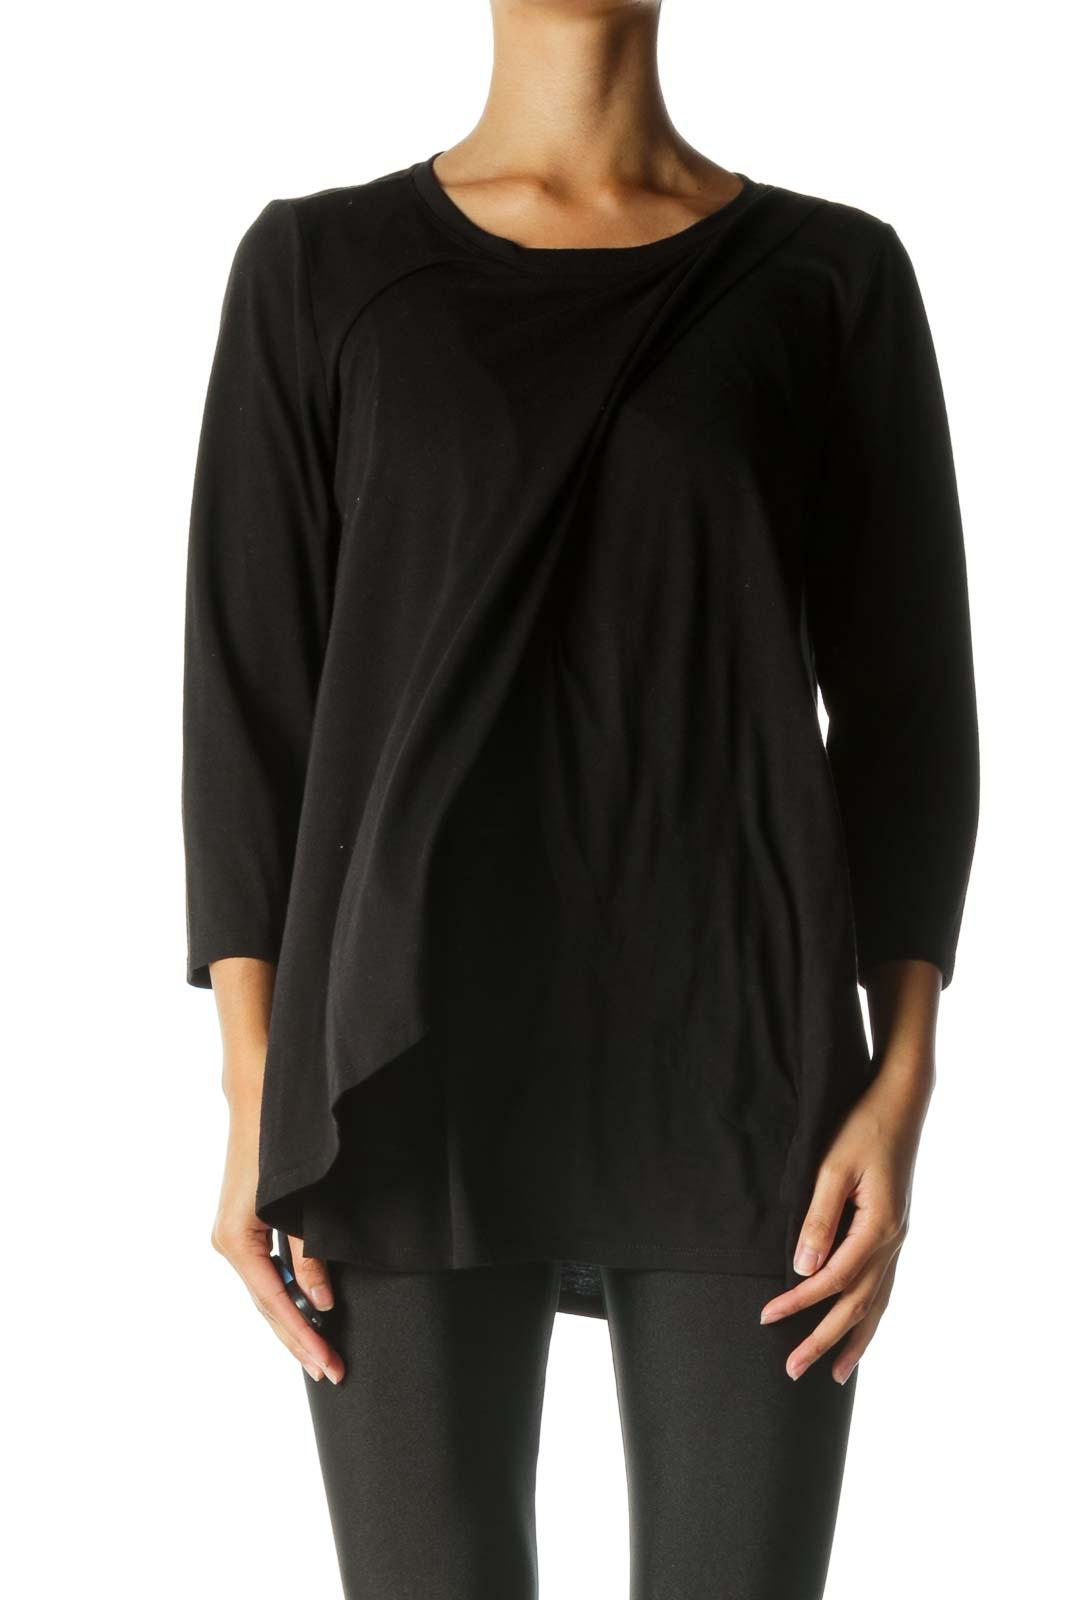 Black Nursing Long Sleeve Shirt Front